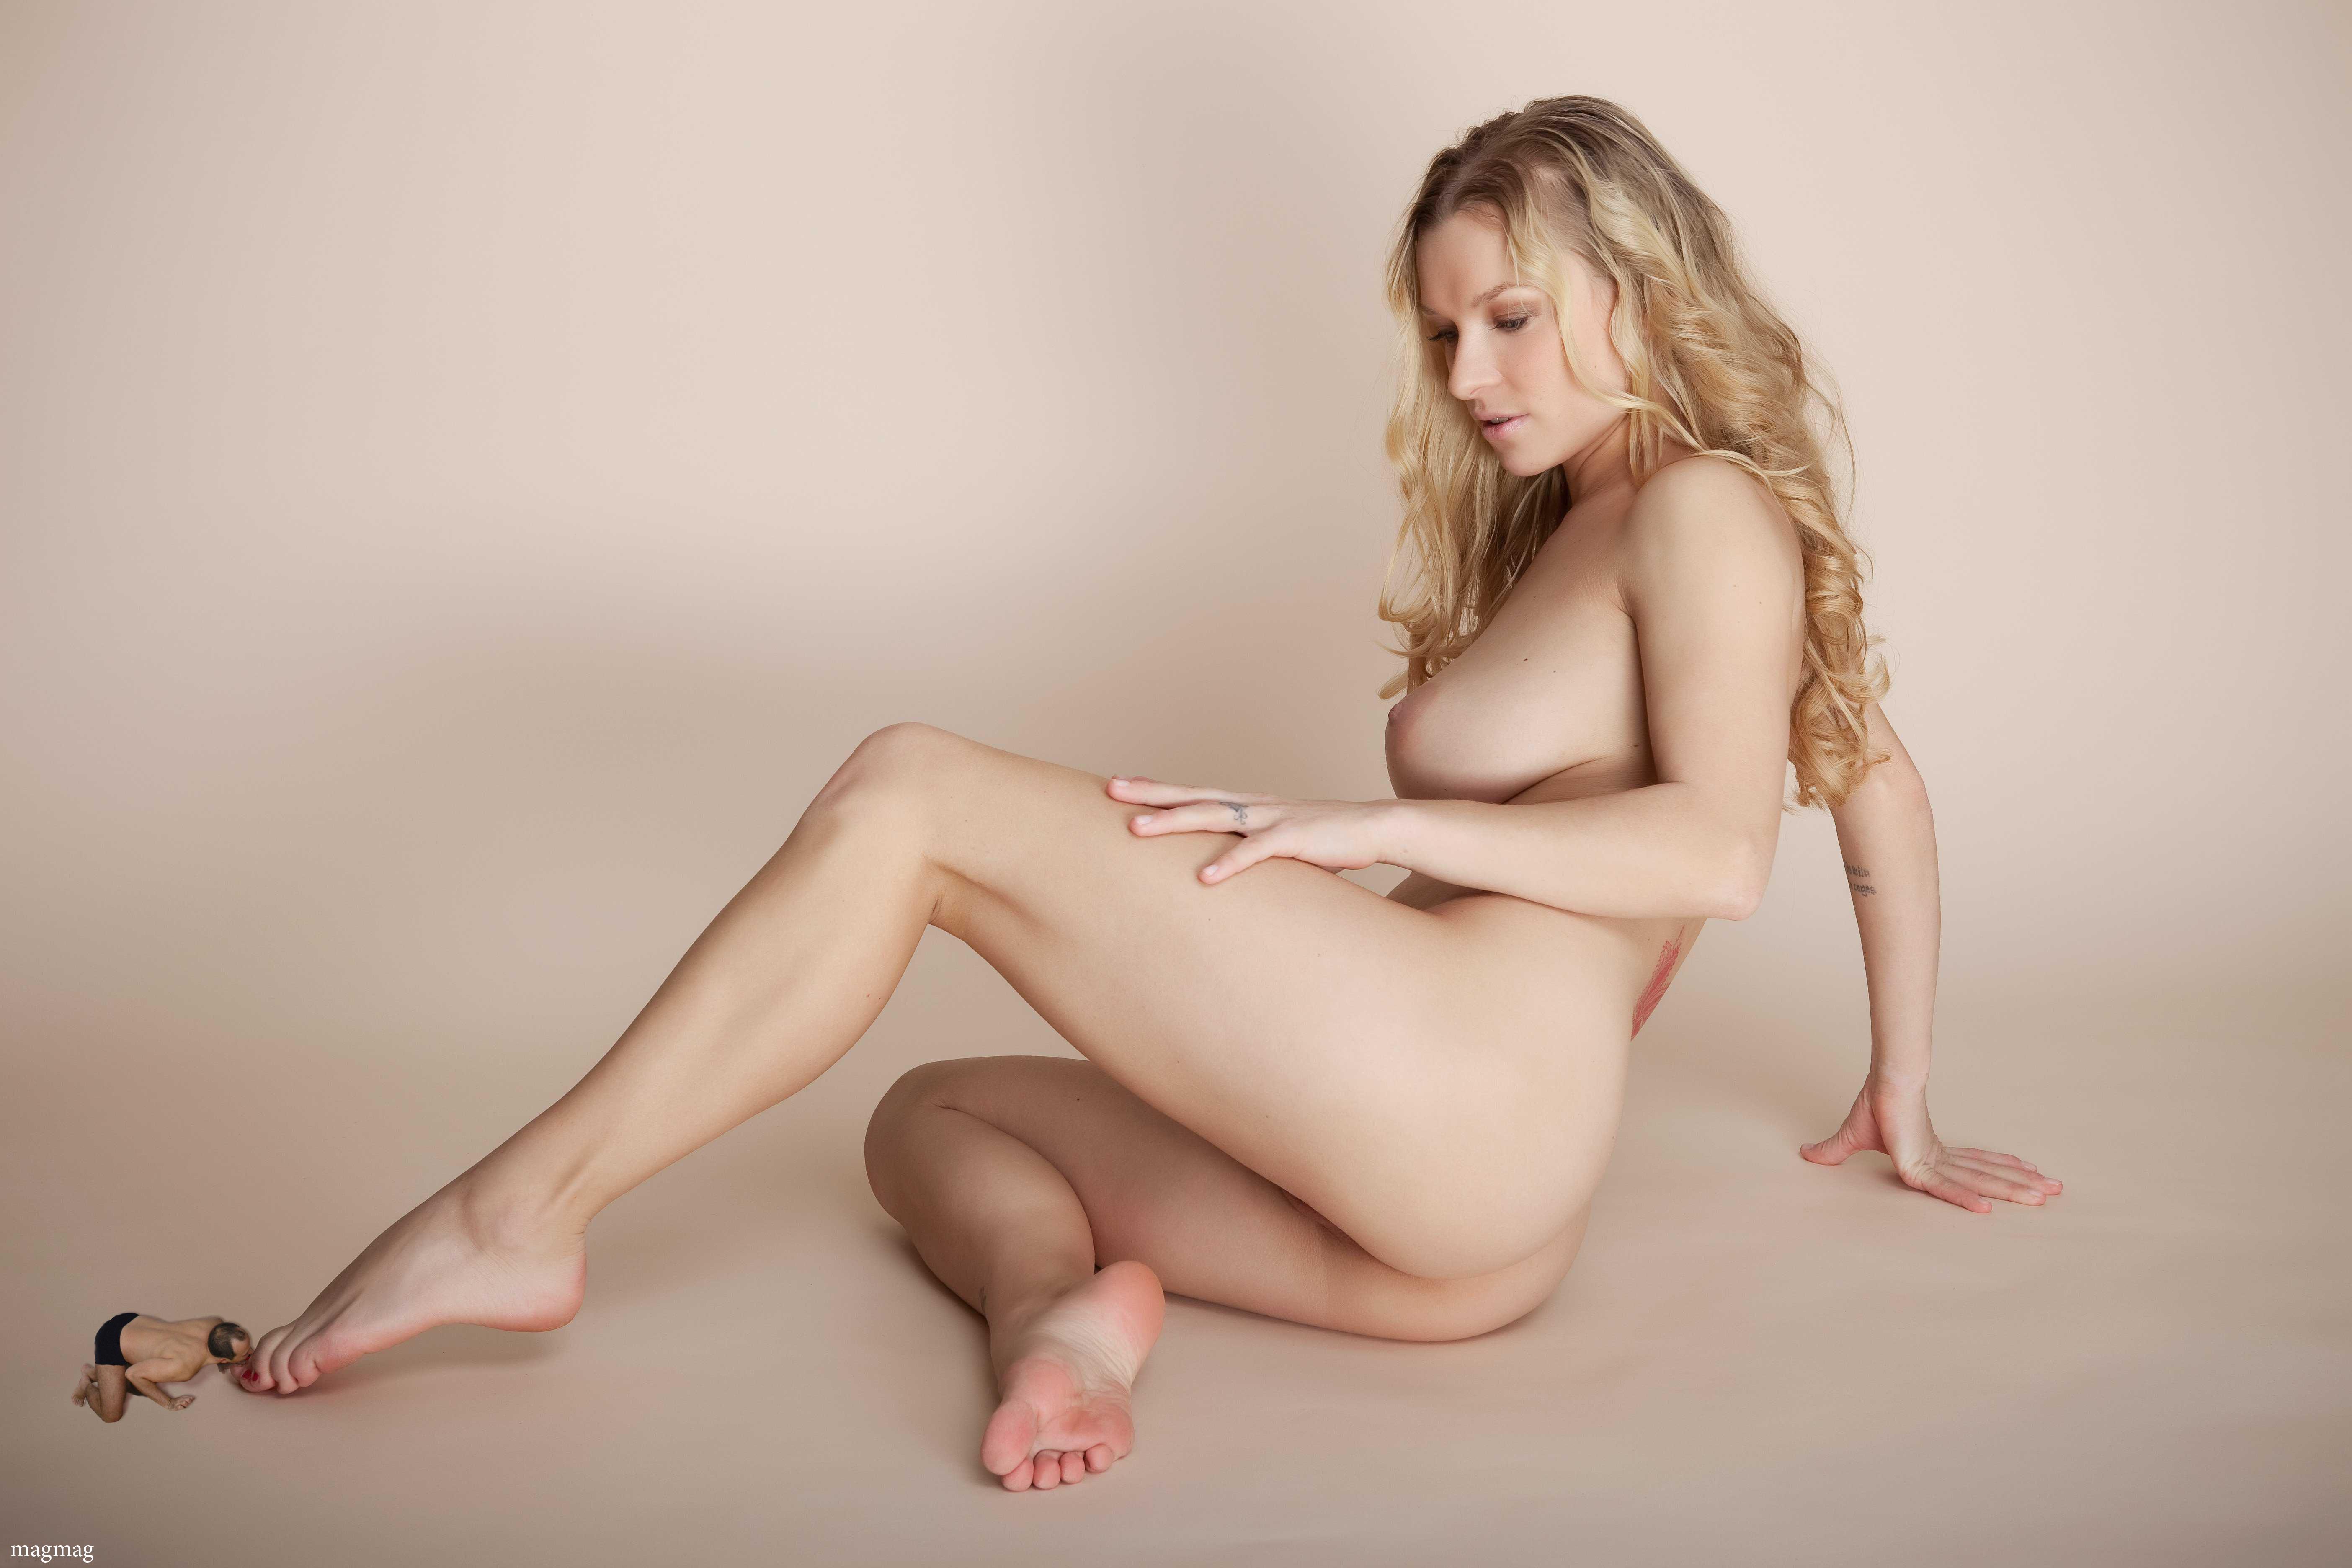 Man Nude Nude Penis Pussy Shrunken Man Shrunken Women ...